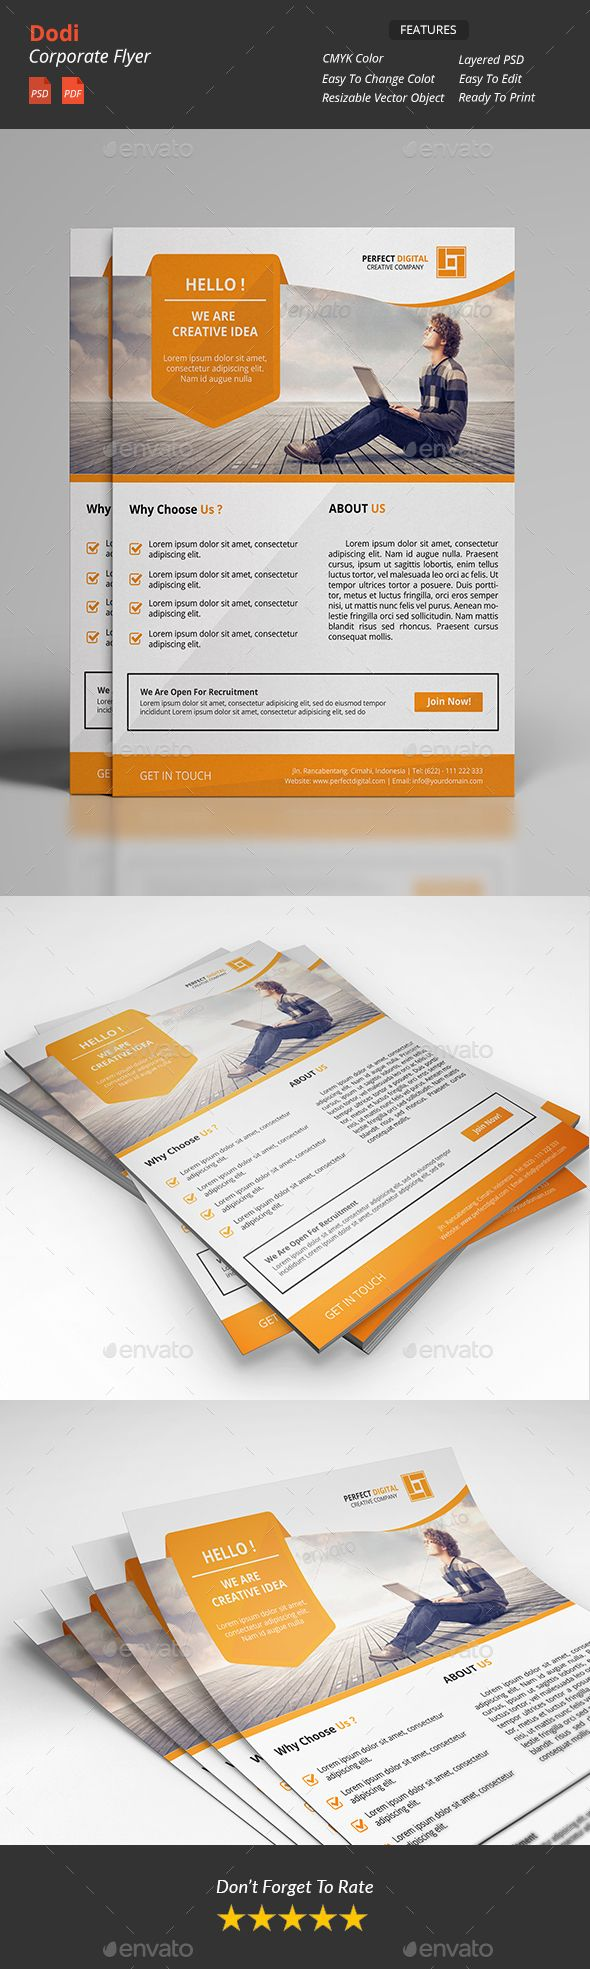 Dodi - Clean Corporate Flyers Template PSD #design Download: http://graphicriver.net/item/dodi-clean-corporate-flyers-v2/14480559?ref=ksioks